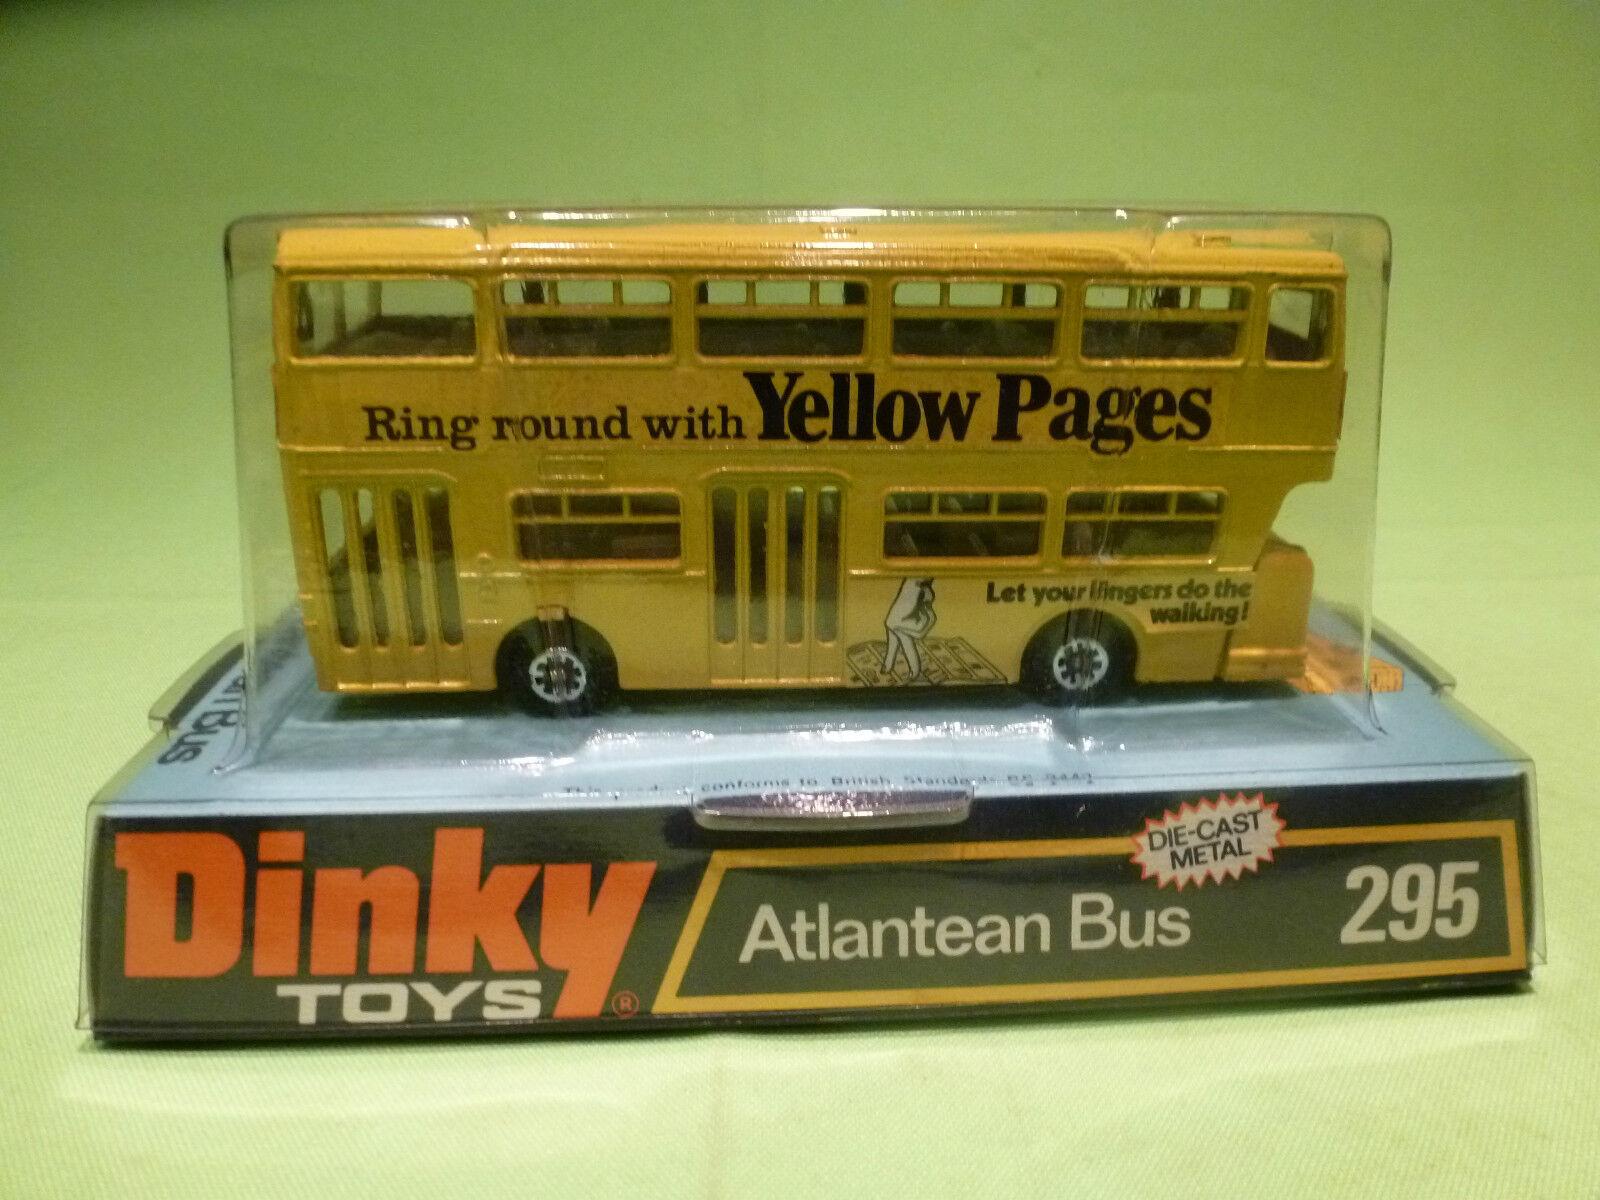 DINKY TOYS 295 ATLANTEAN BUS - amarillo PAGES - RARE SELTEN - GOOD IN BOX